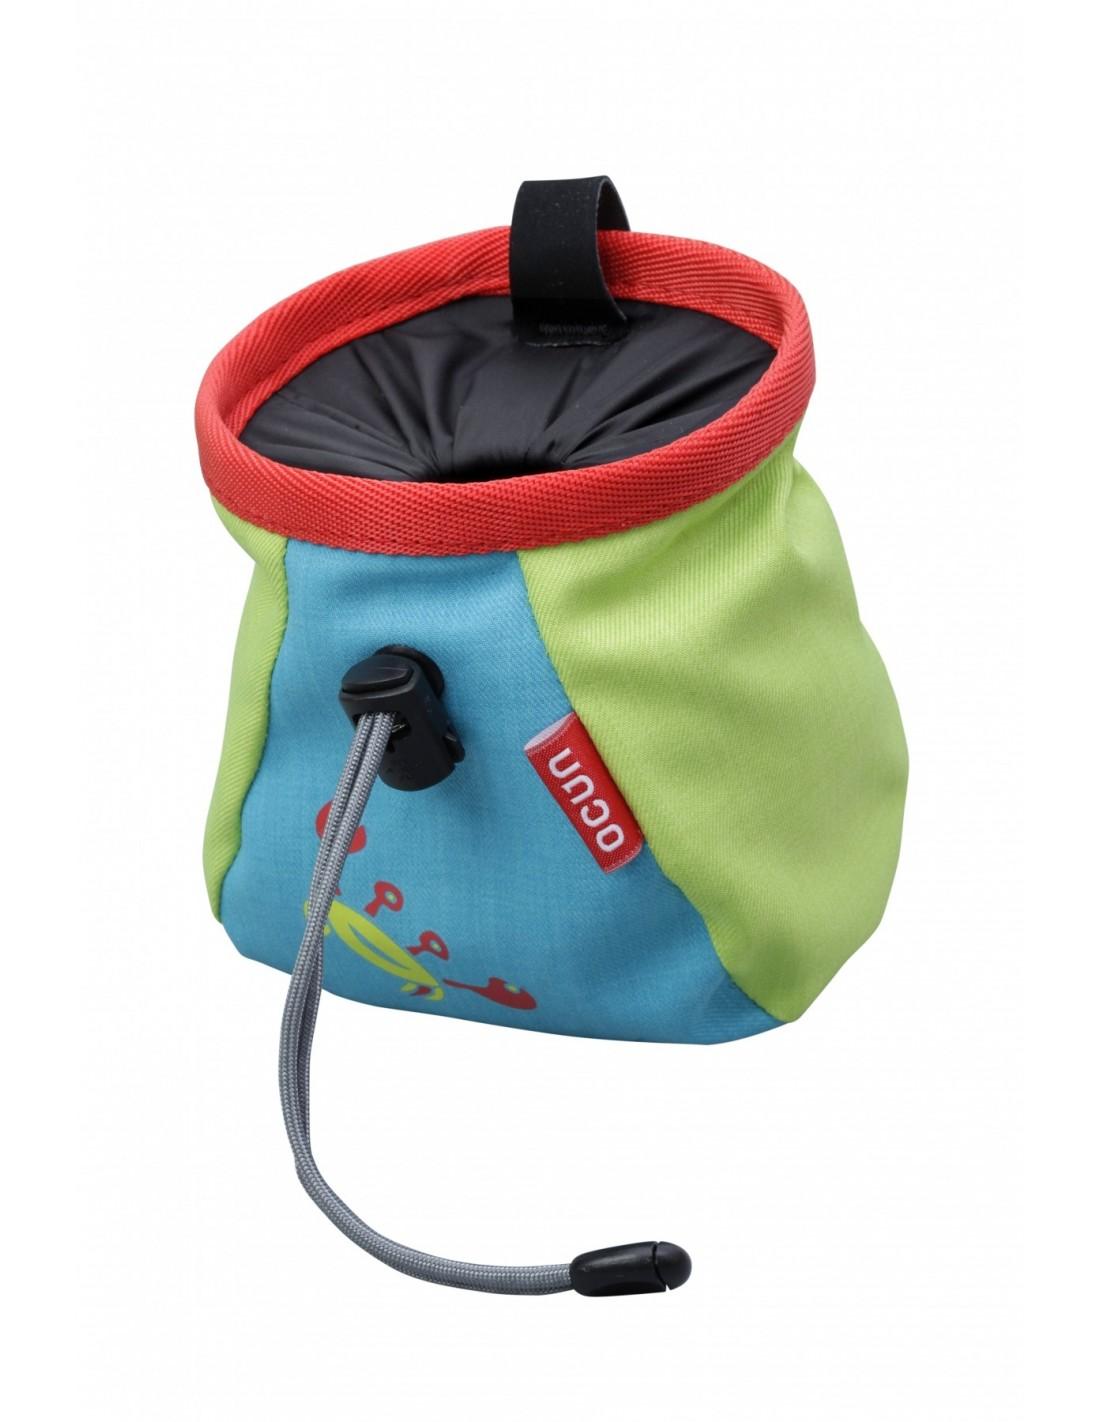 Ocun Chalkbag Lucks Kid - Blue Chalkbag Verwendung - Klettern, Chalkbag Farbe -